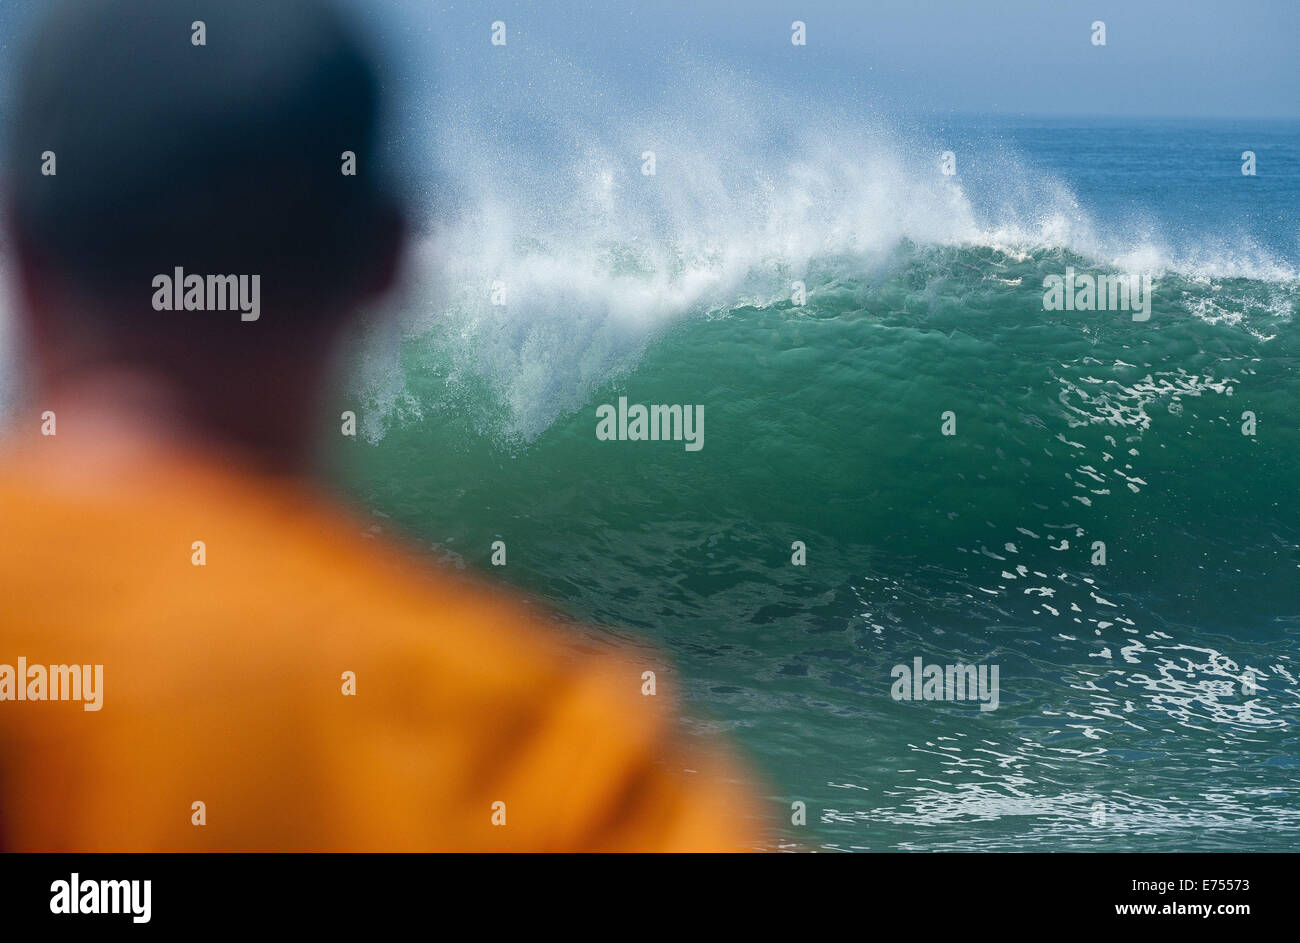 Wedge Like Stock Photos & Wedge Like Stock Images - Alamy